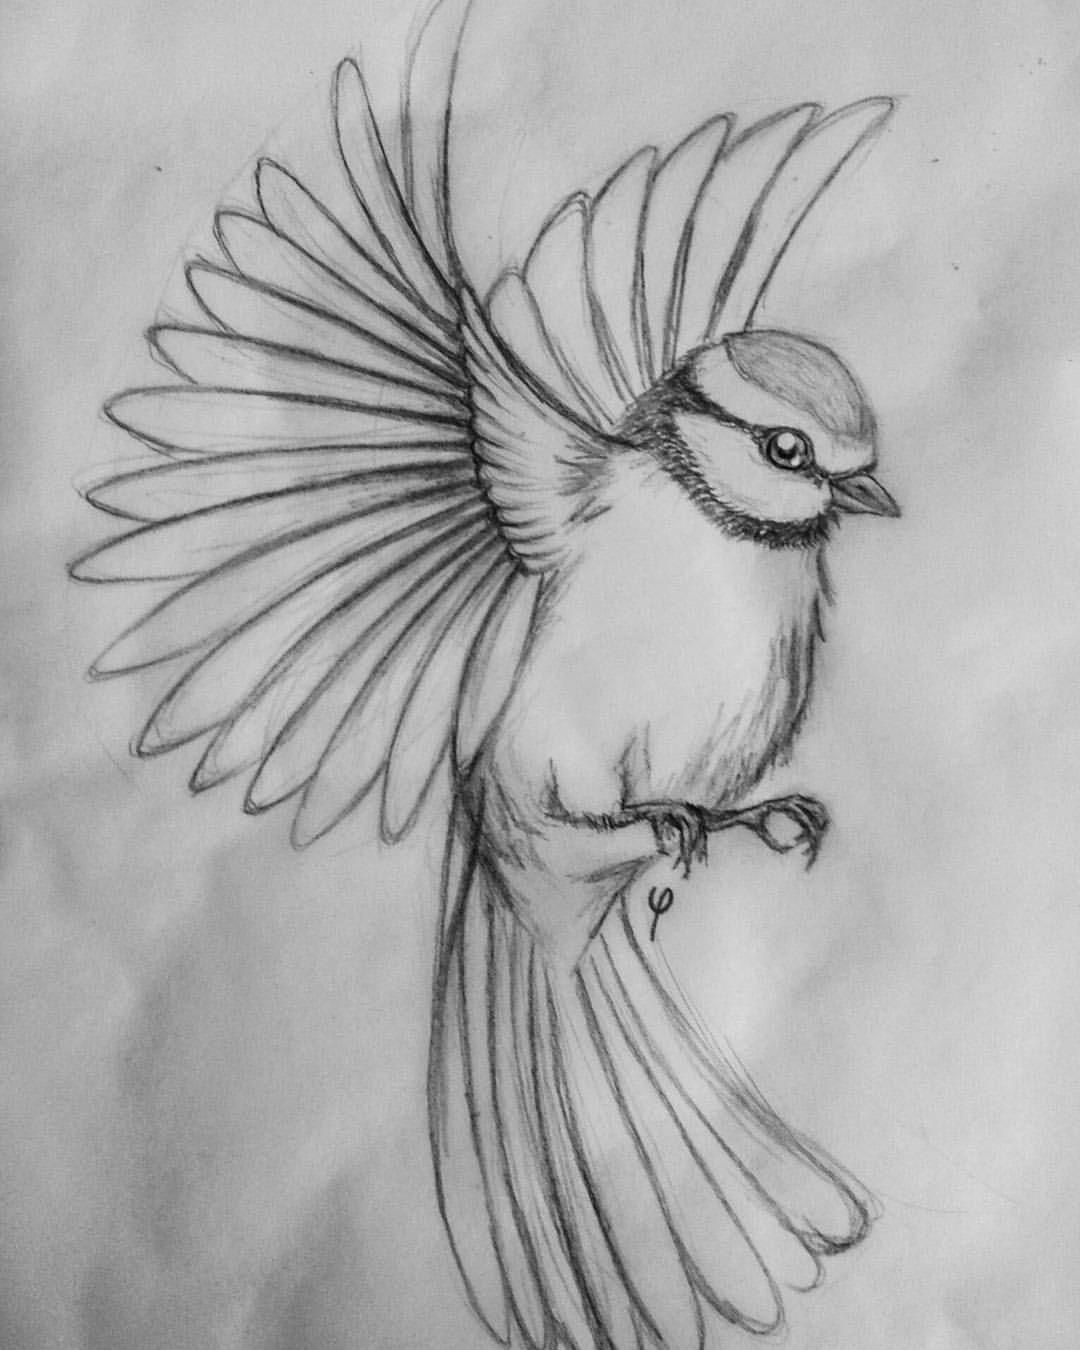 "Camilla on Instagram: ""blue tit sketch #bluetit #tomtit #bird #flying #drawing #sketch #illustration #art #artwork #blackwork #pencil #pencildrawing #blackandwhite"""